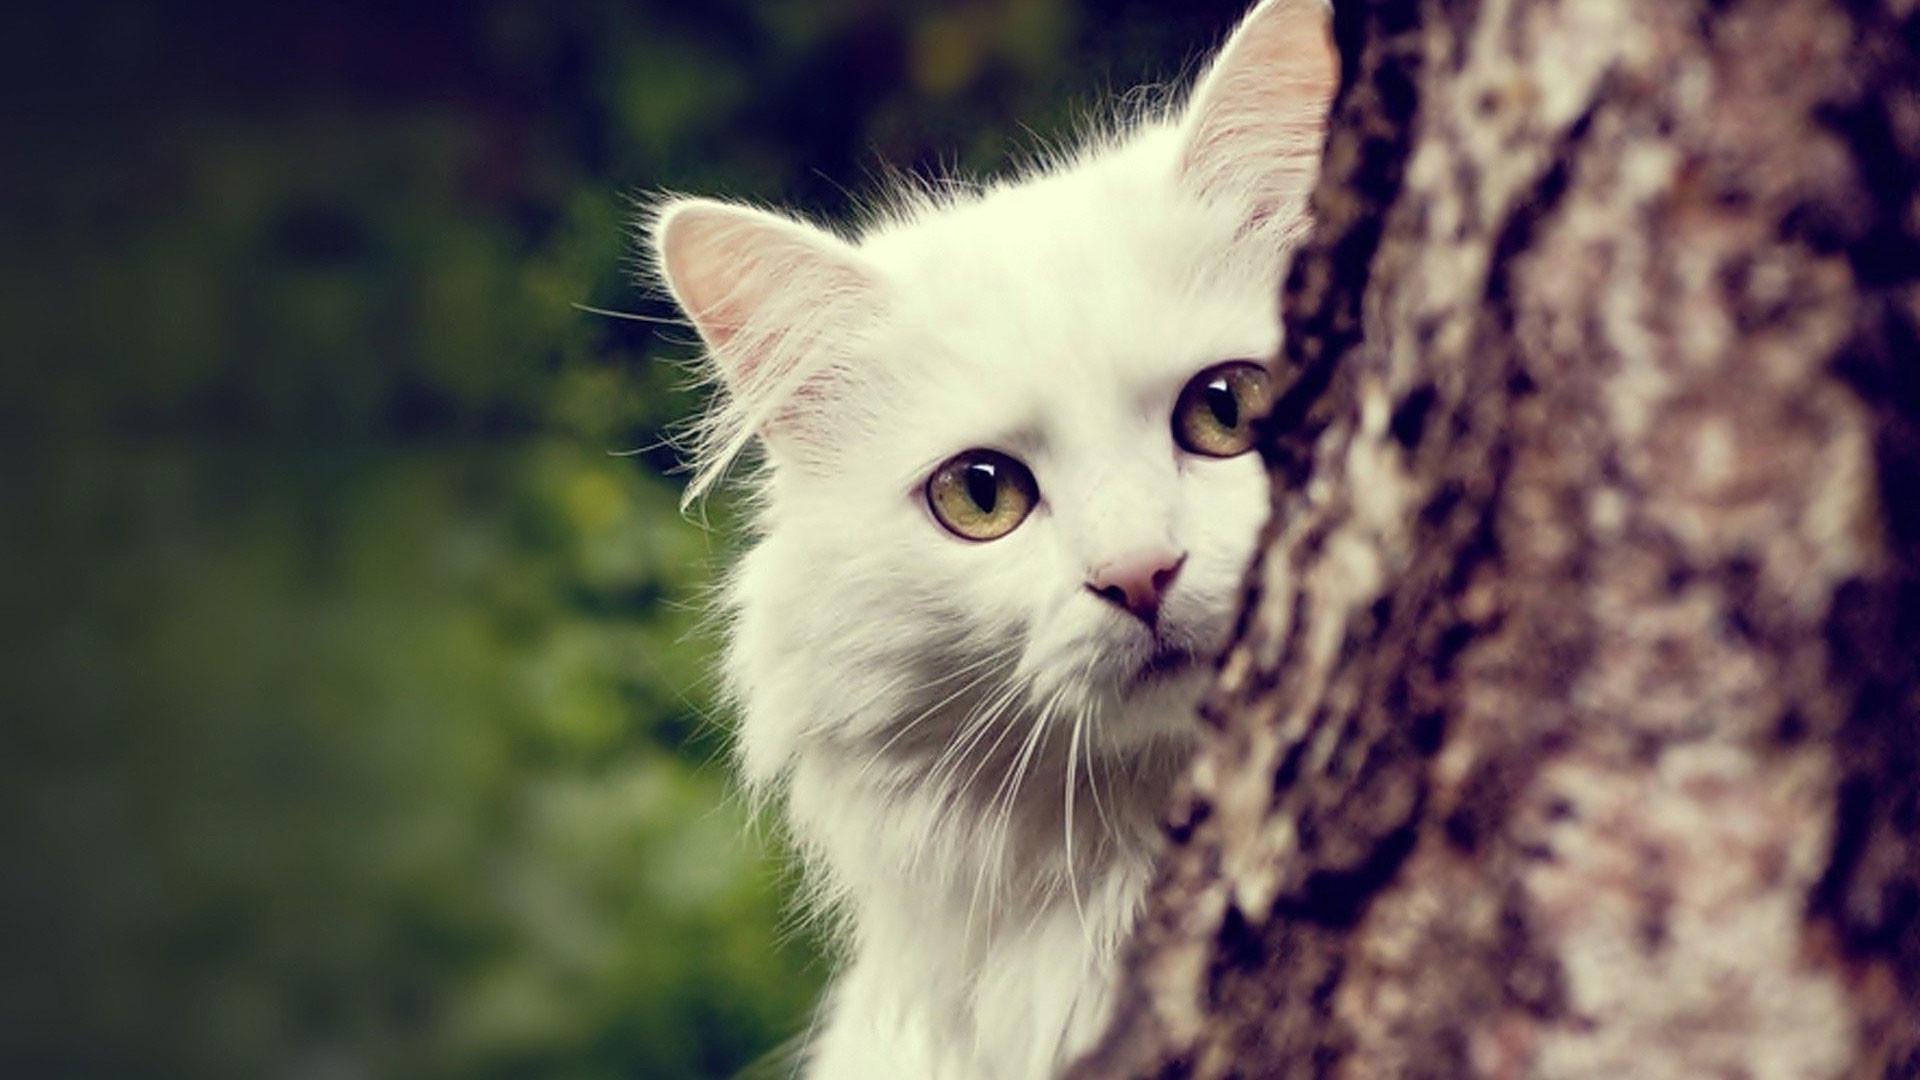 hd pics photos very cute white cat tree hd quality desktop background  wallpaper